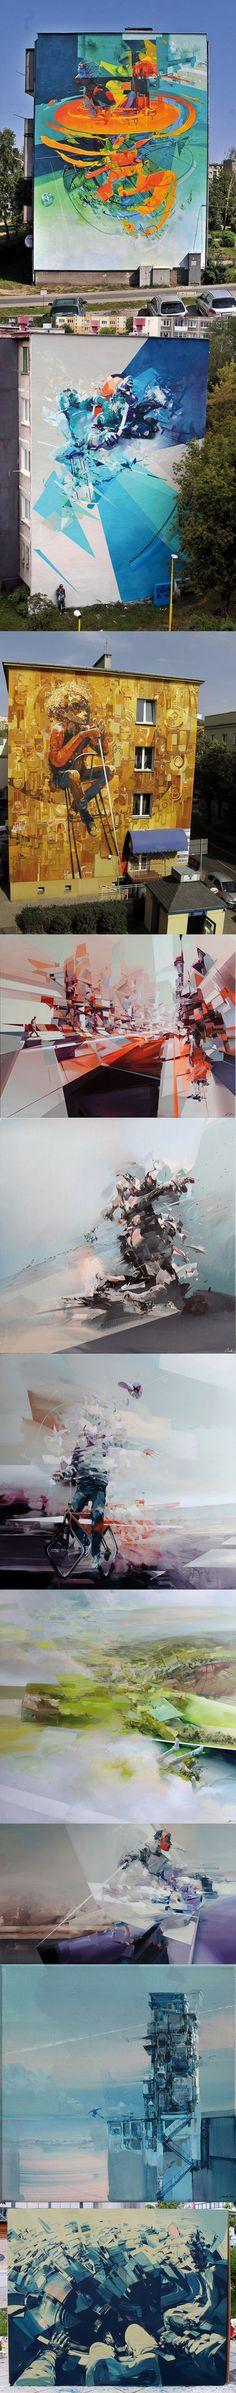 Robert Proch. Amazing.